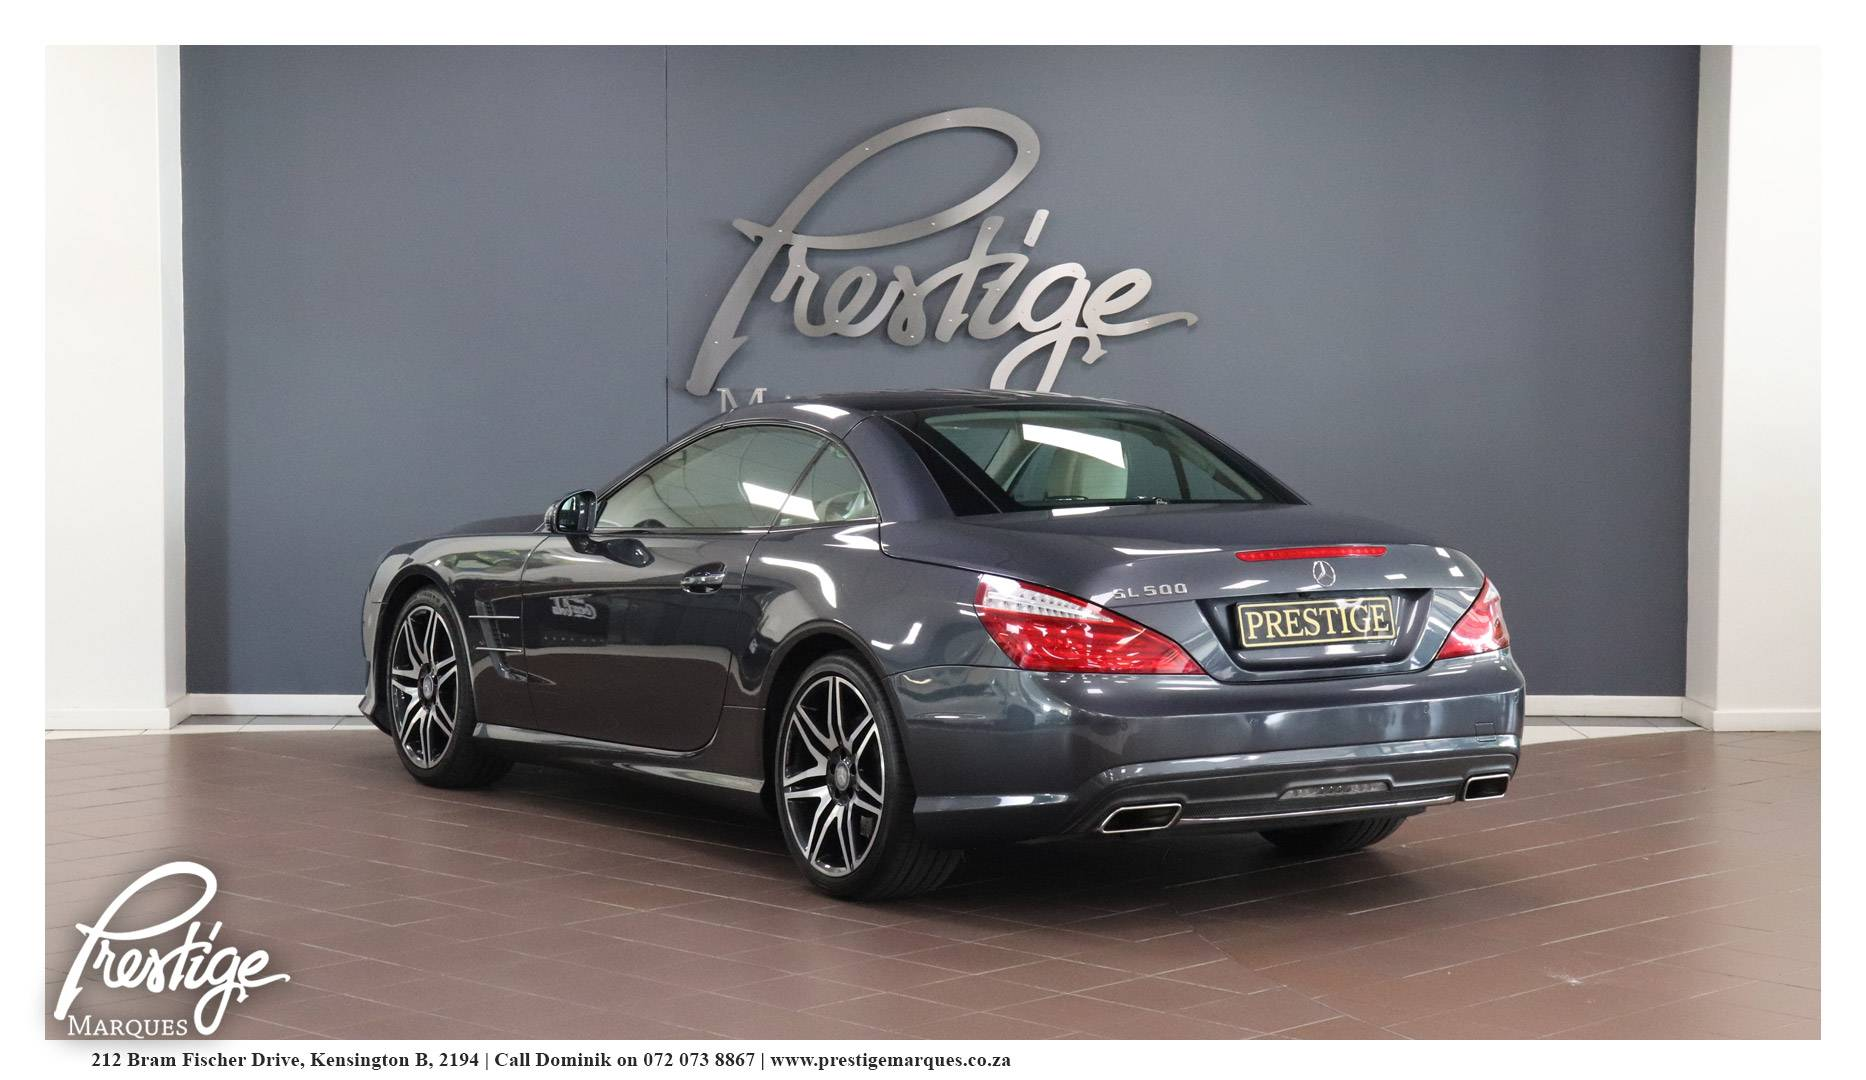 2014-Merc-SL-500-AMG-Grey-Prestige-MArques-Sandton-Randburg-9